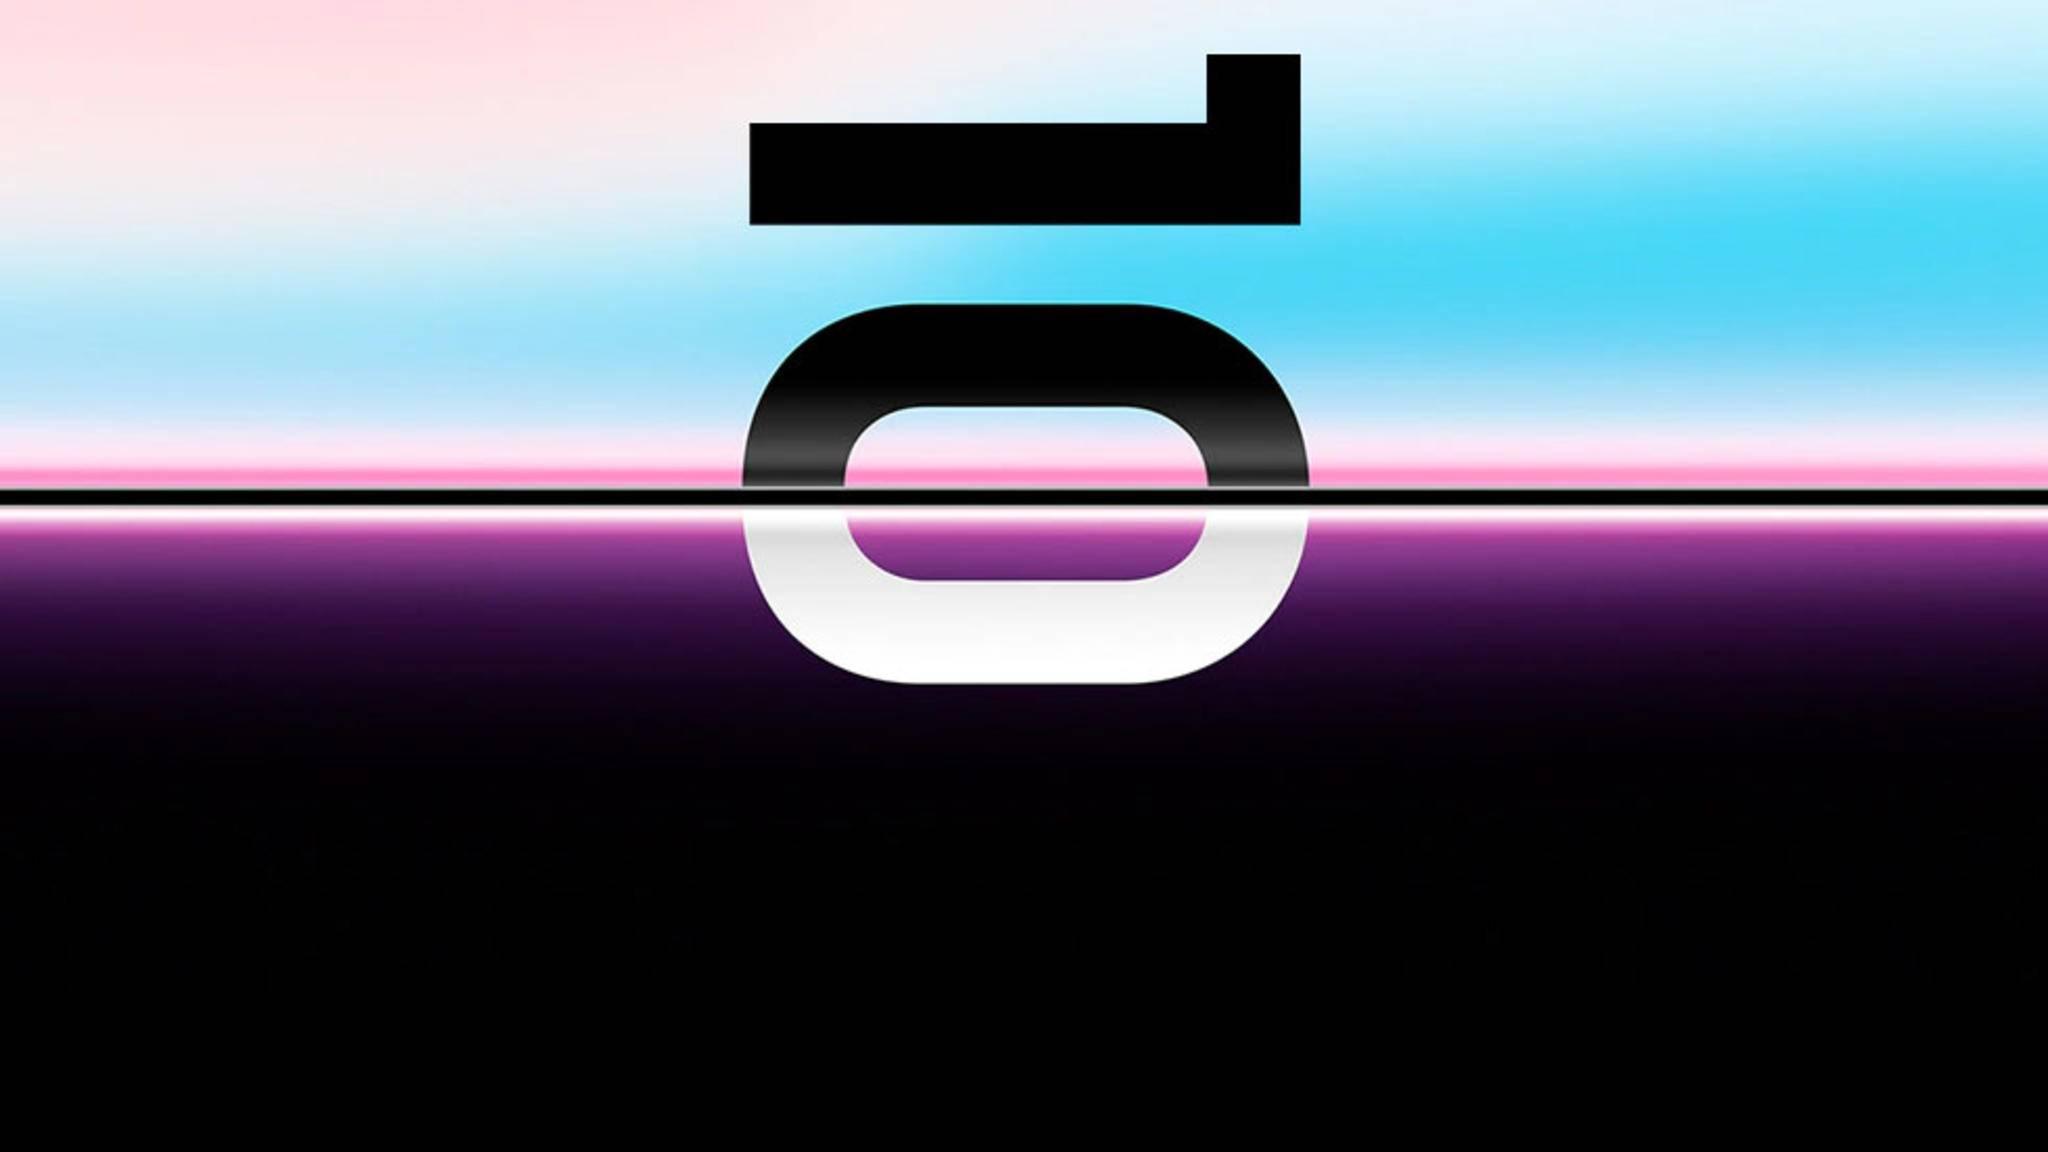 Es ist offiziell: Das Galaxy S10 wird am 20. Februar in San Francisco enthüllt.